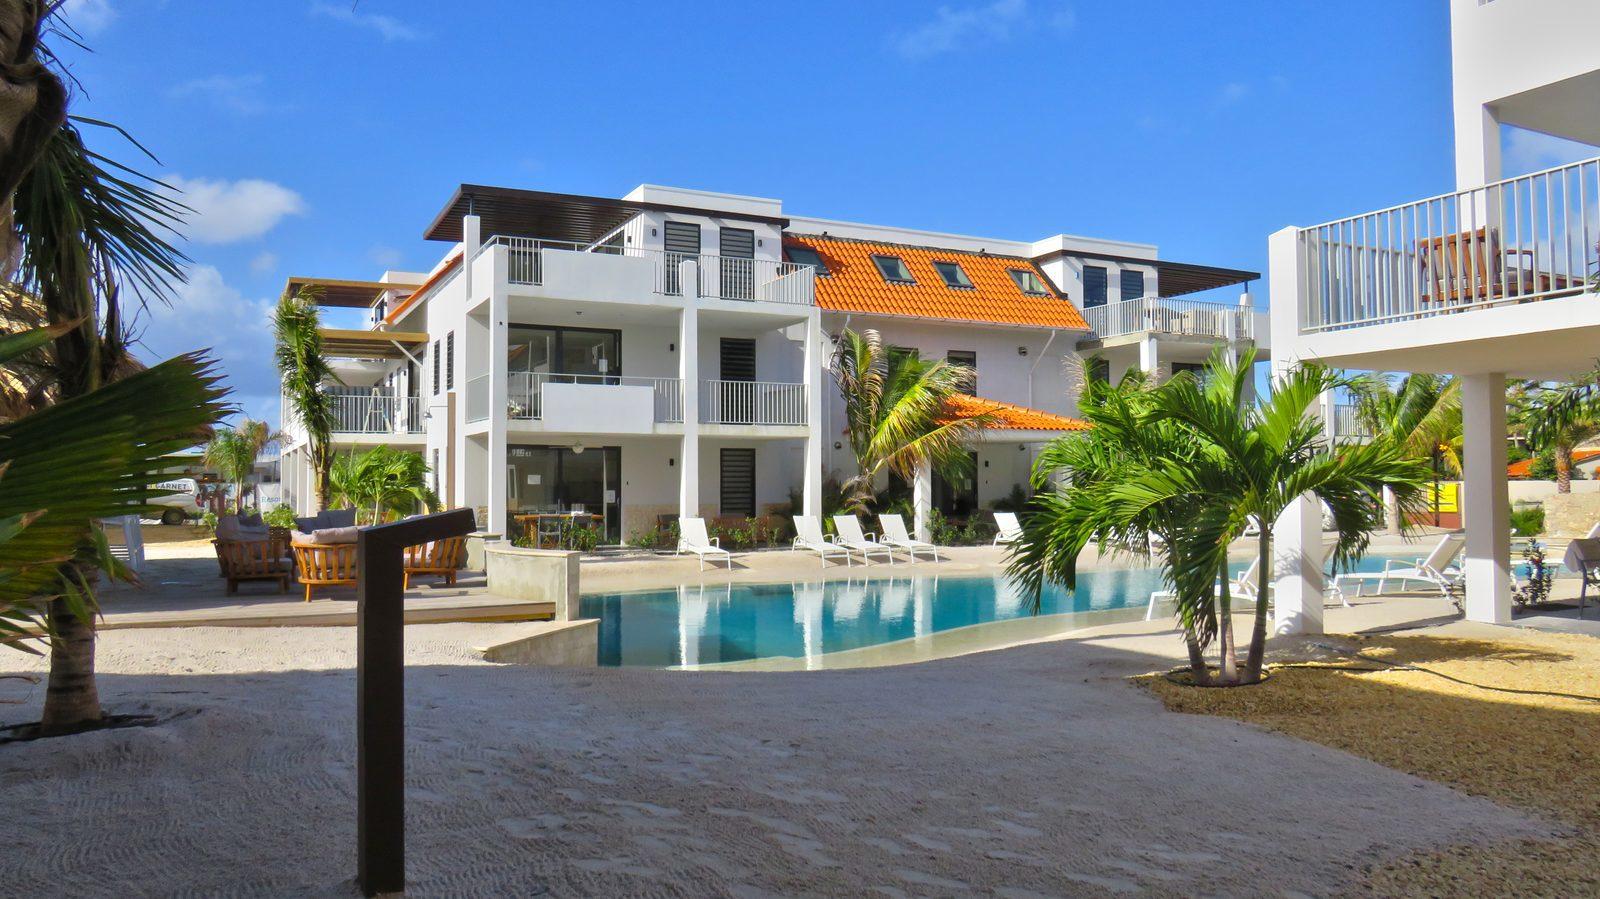 Bonaire vacation rentals